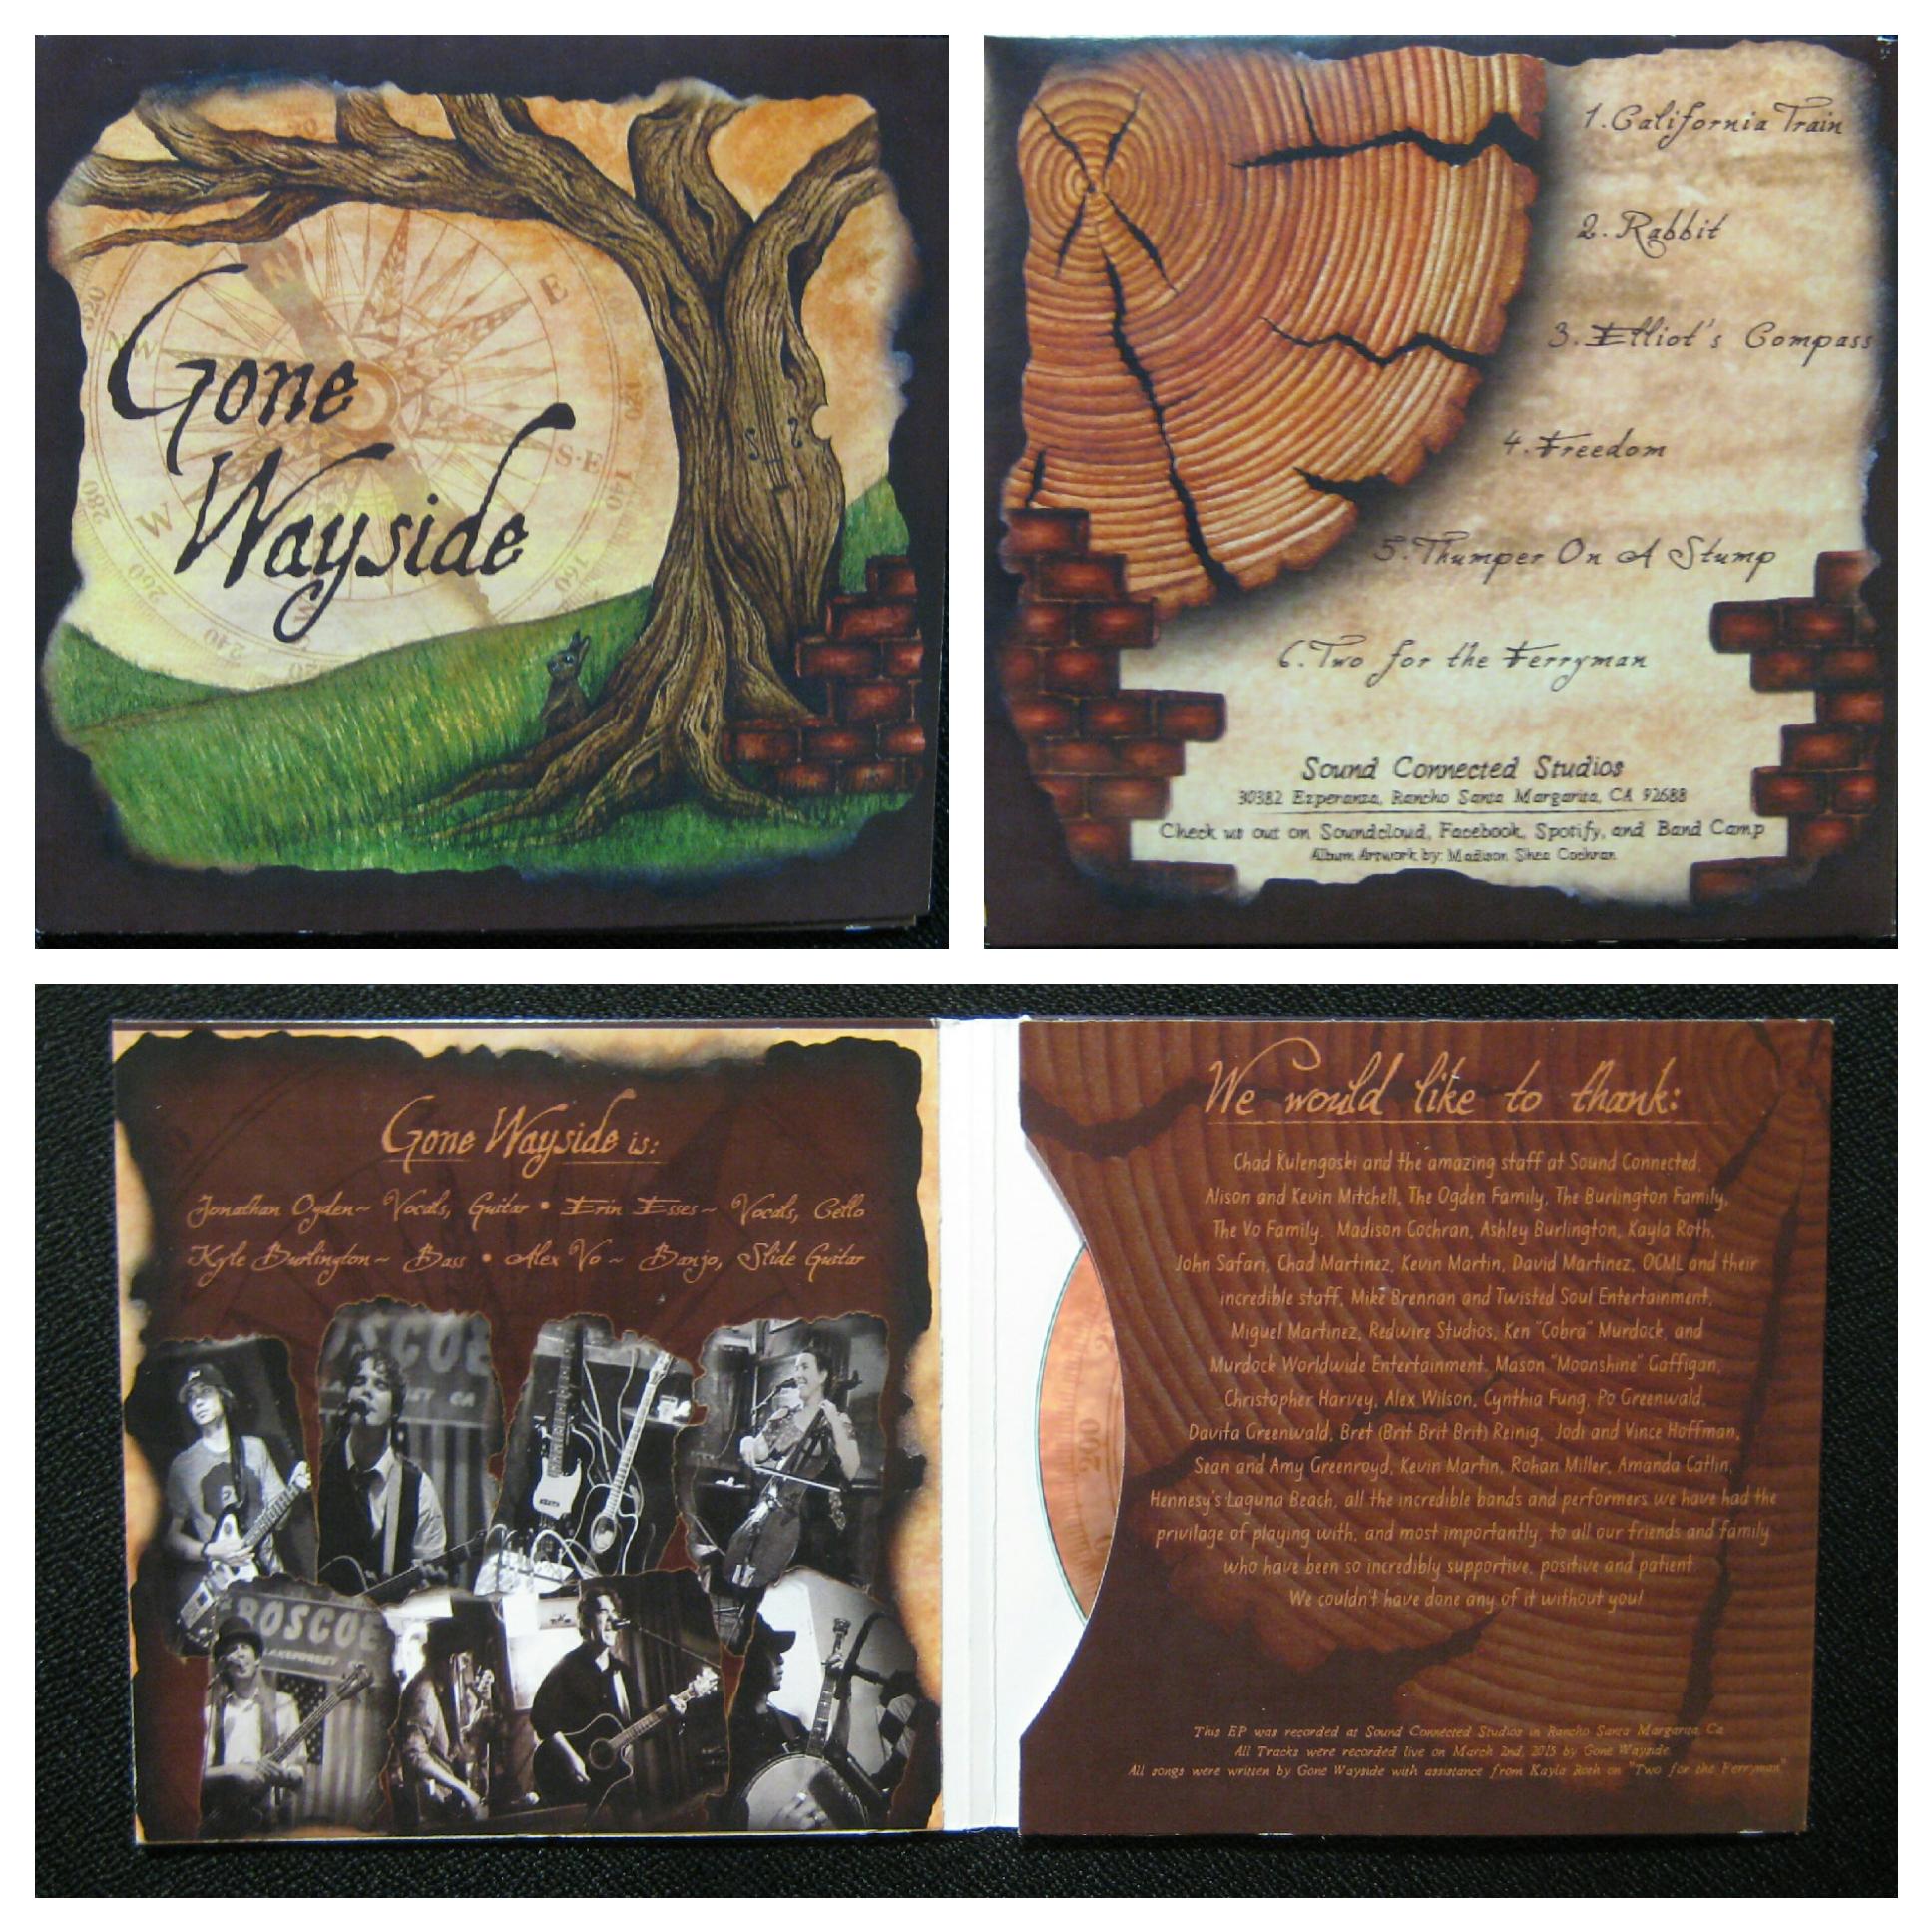 Album artwork for Gone wayside